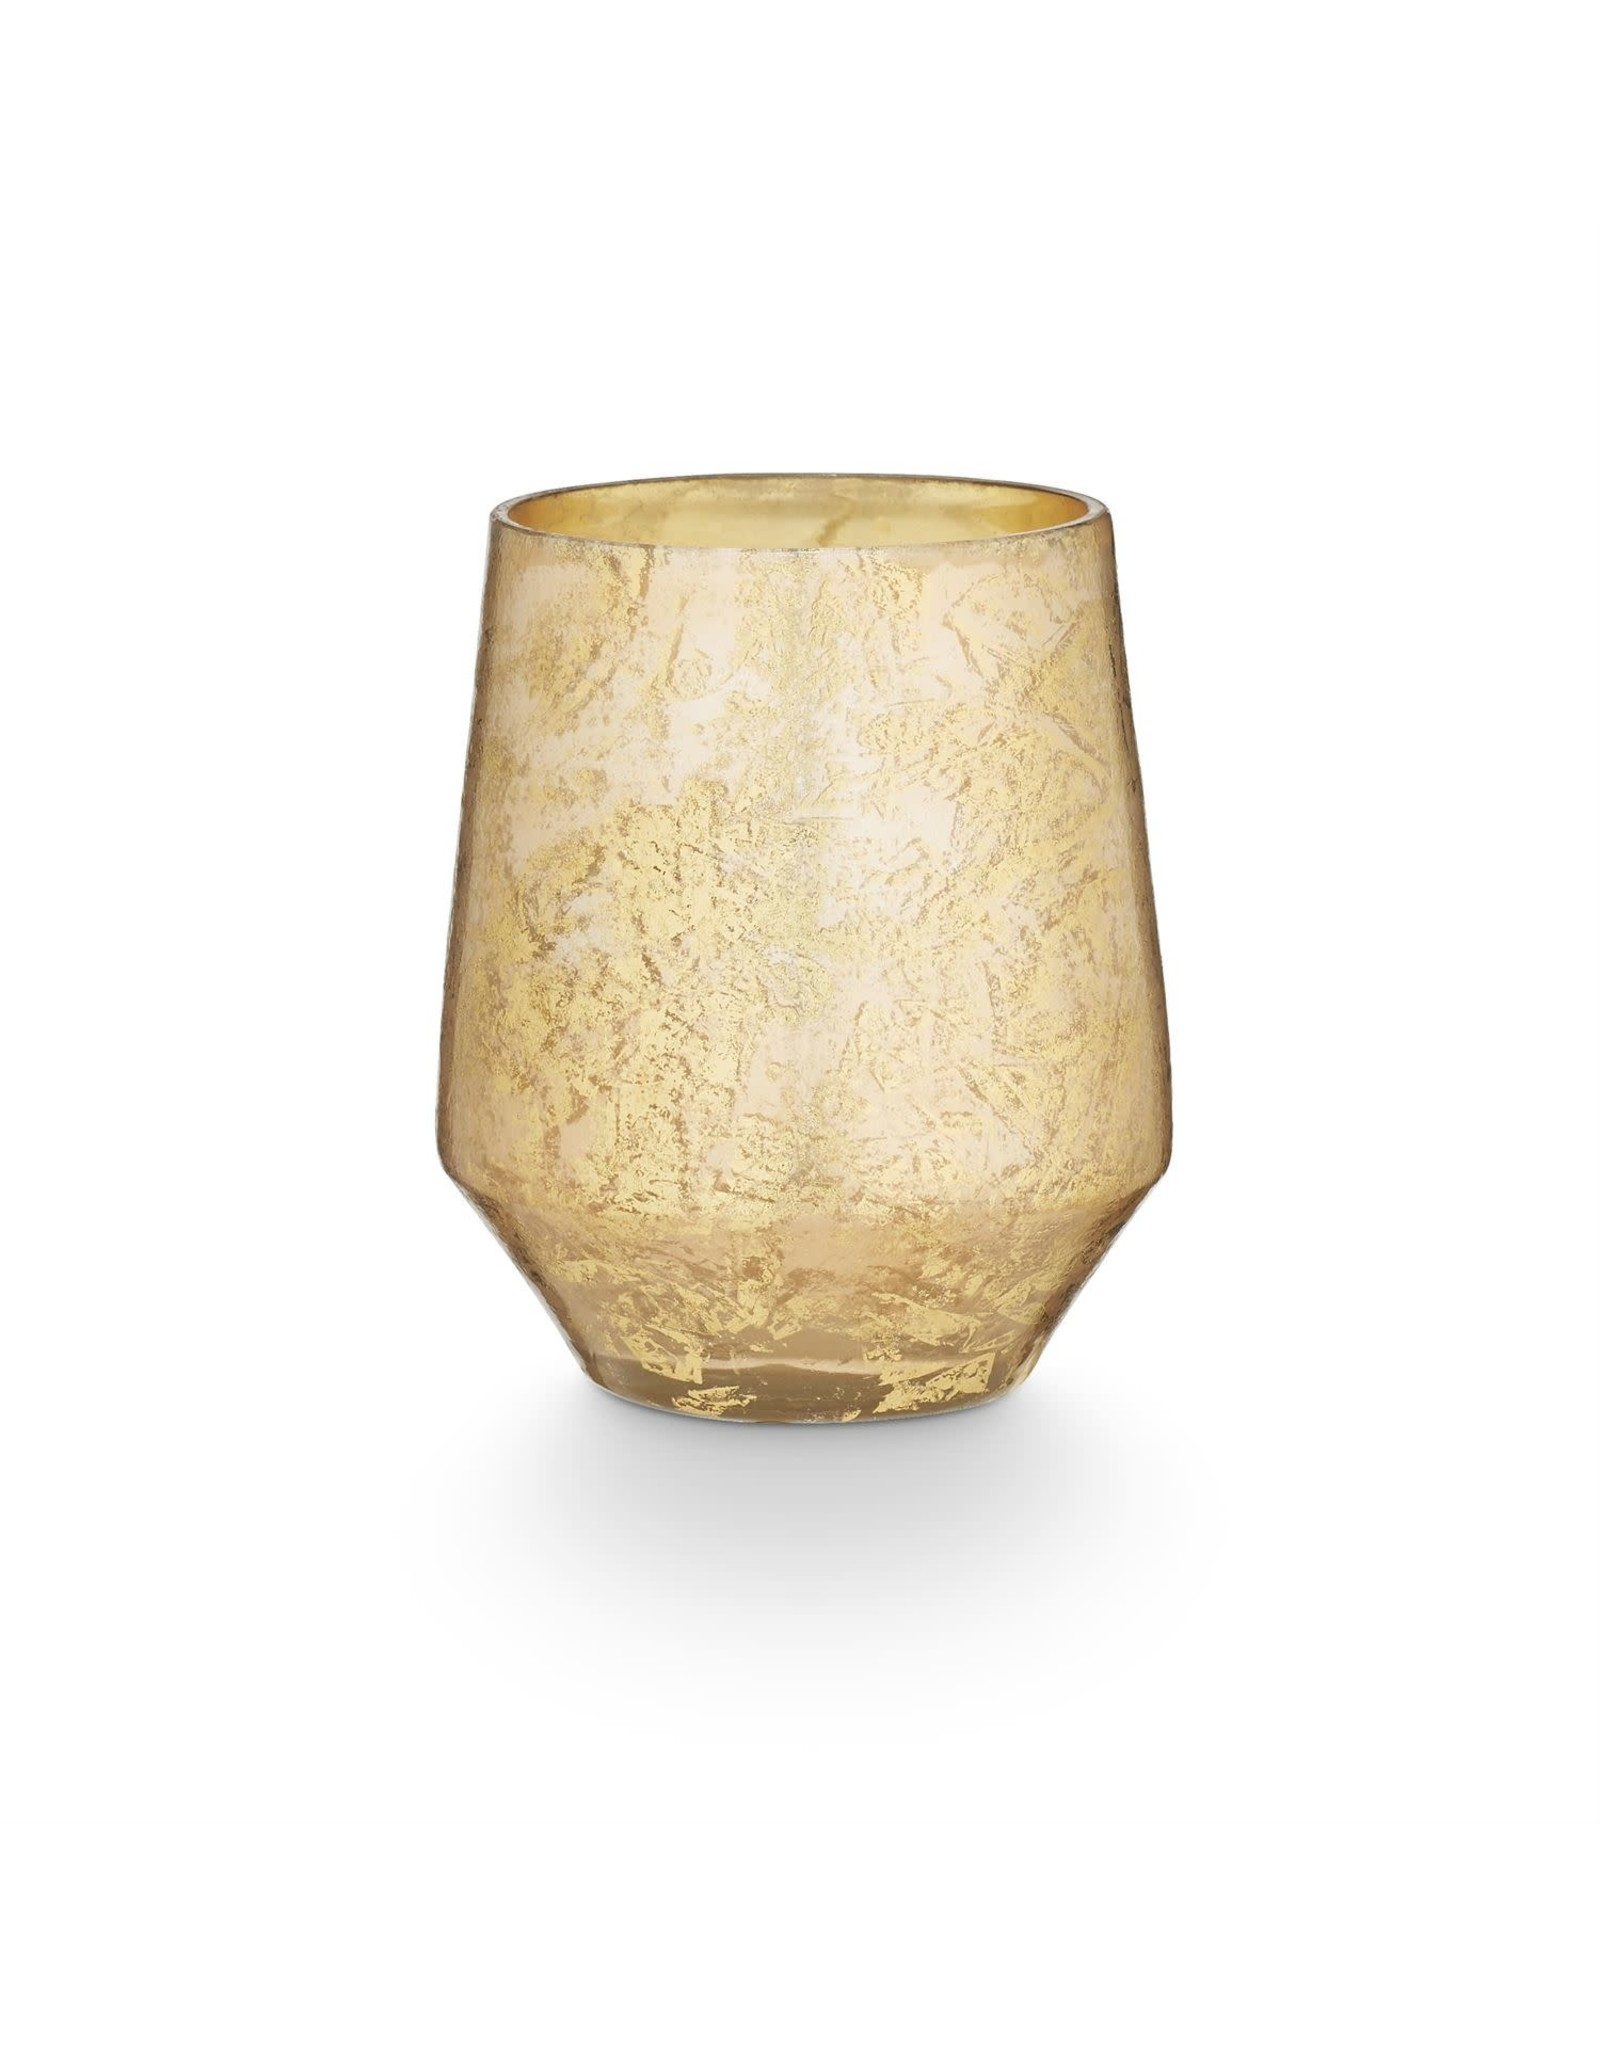 Illume 11 oz Desert Glass Candle - Coconut Mango